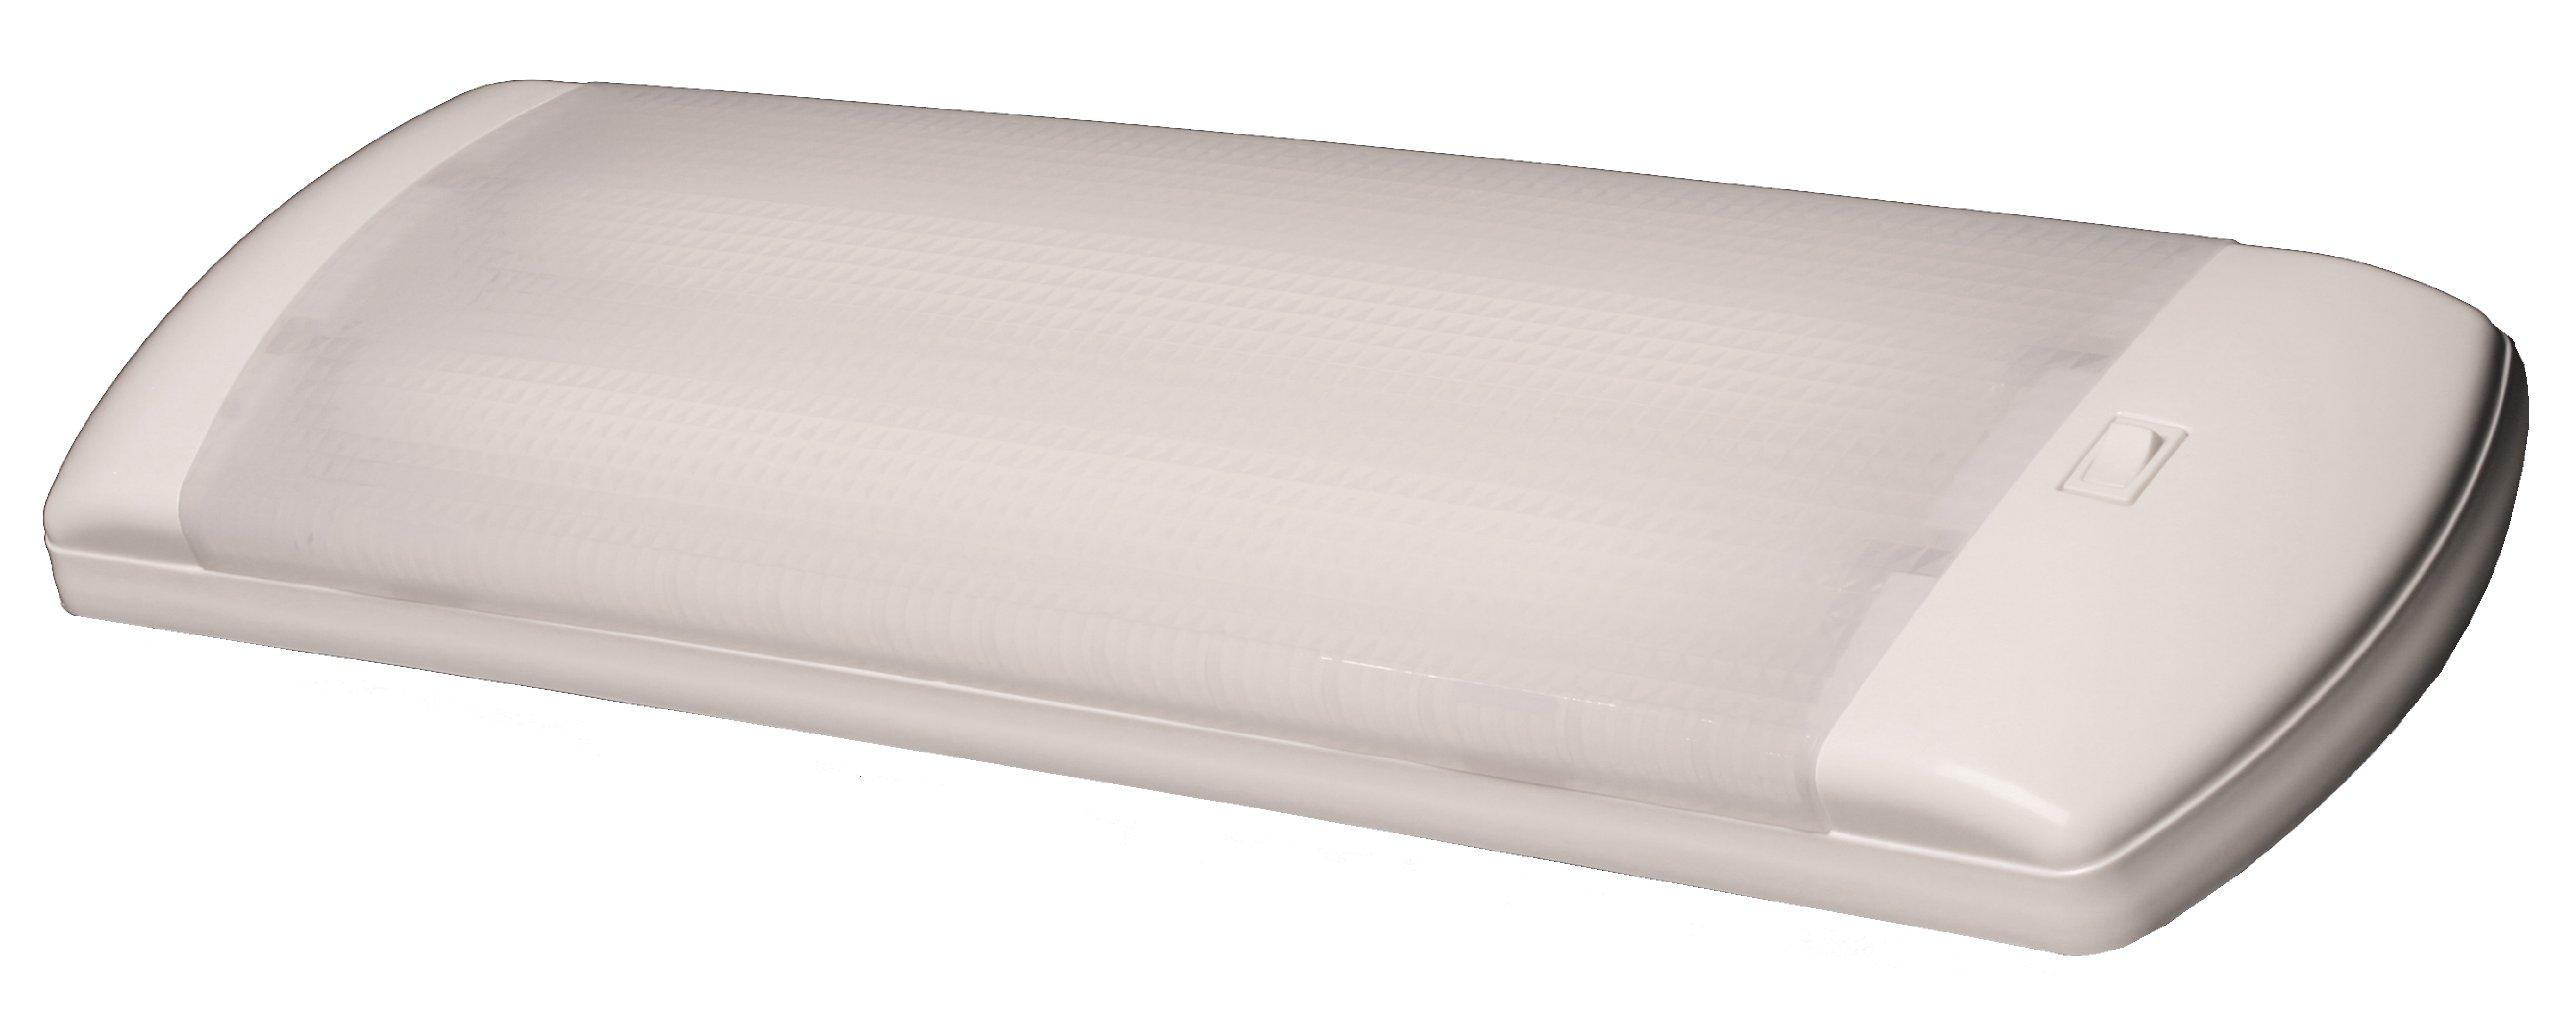 Arcon 13813 30W 12V Fluorescent Light